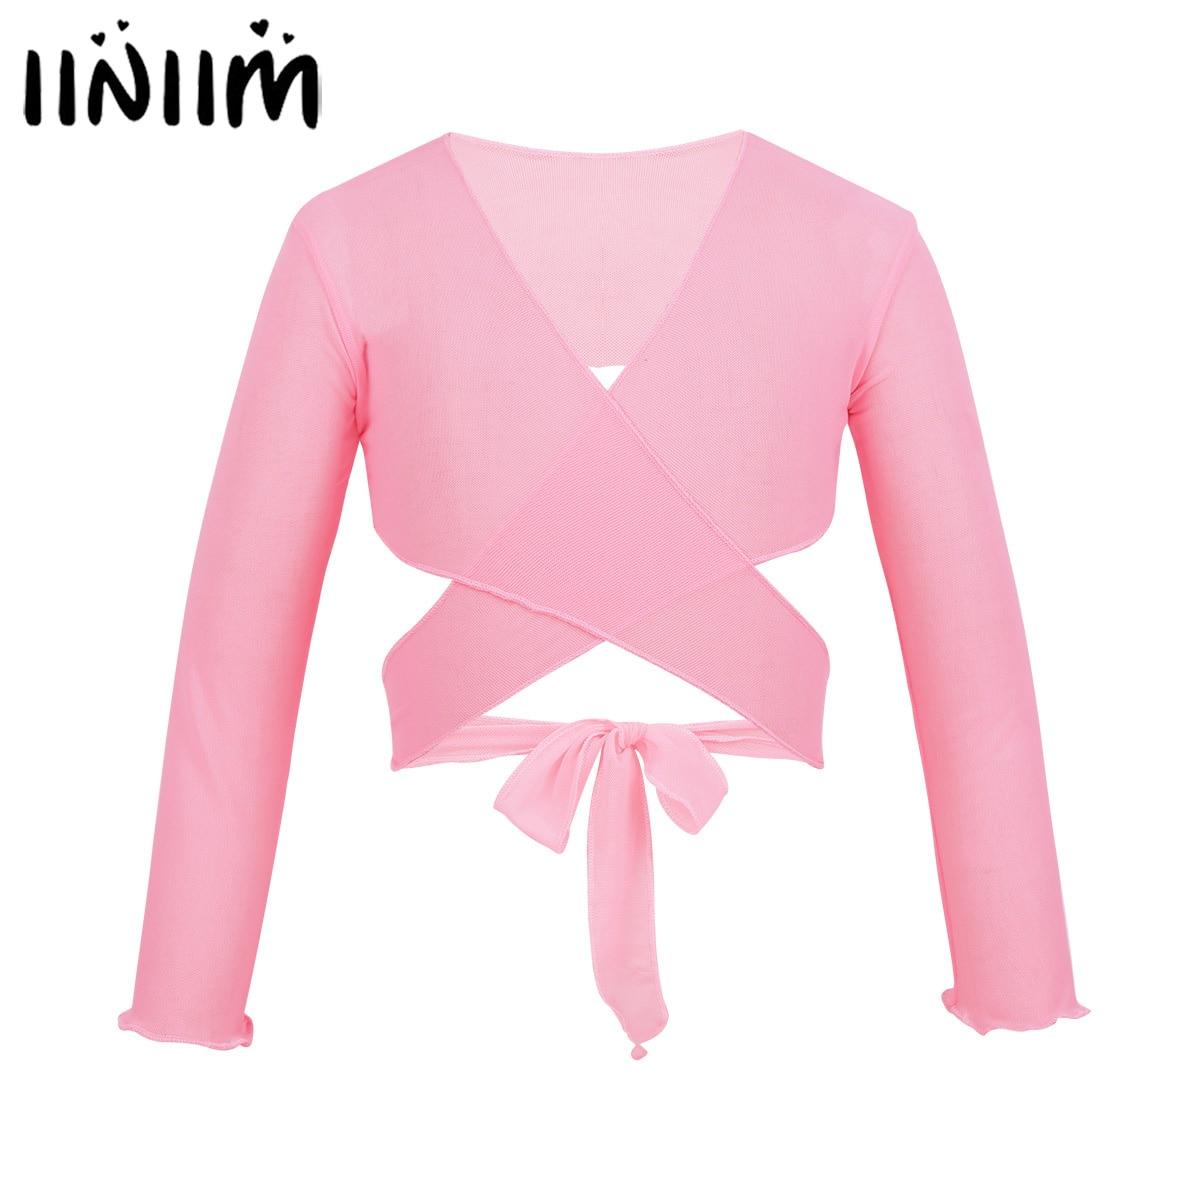 iiniim Kids Girls Ballet Tutu Lyrical  Ballerina Costumes Wrap Top with Adjustable Tie Closure Gymnastics Leotard Dance Wear